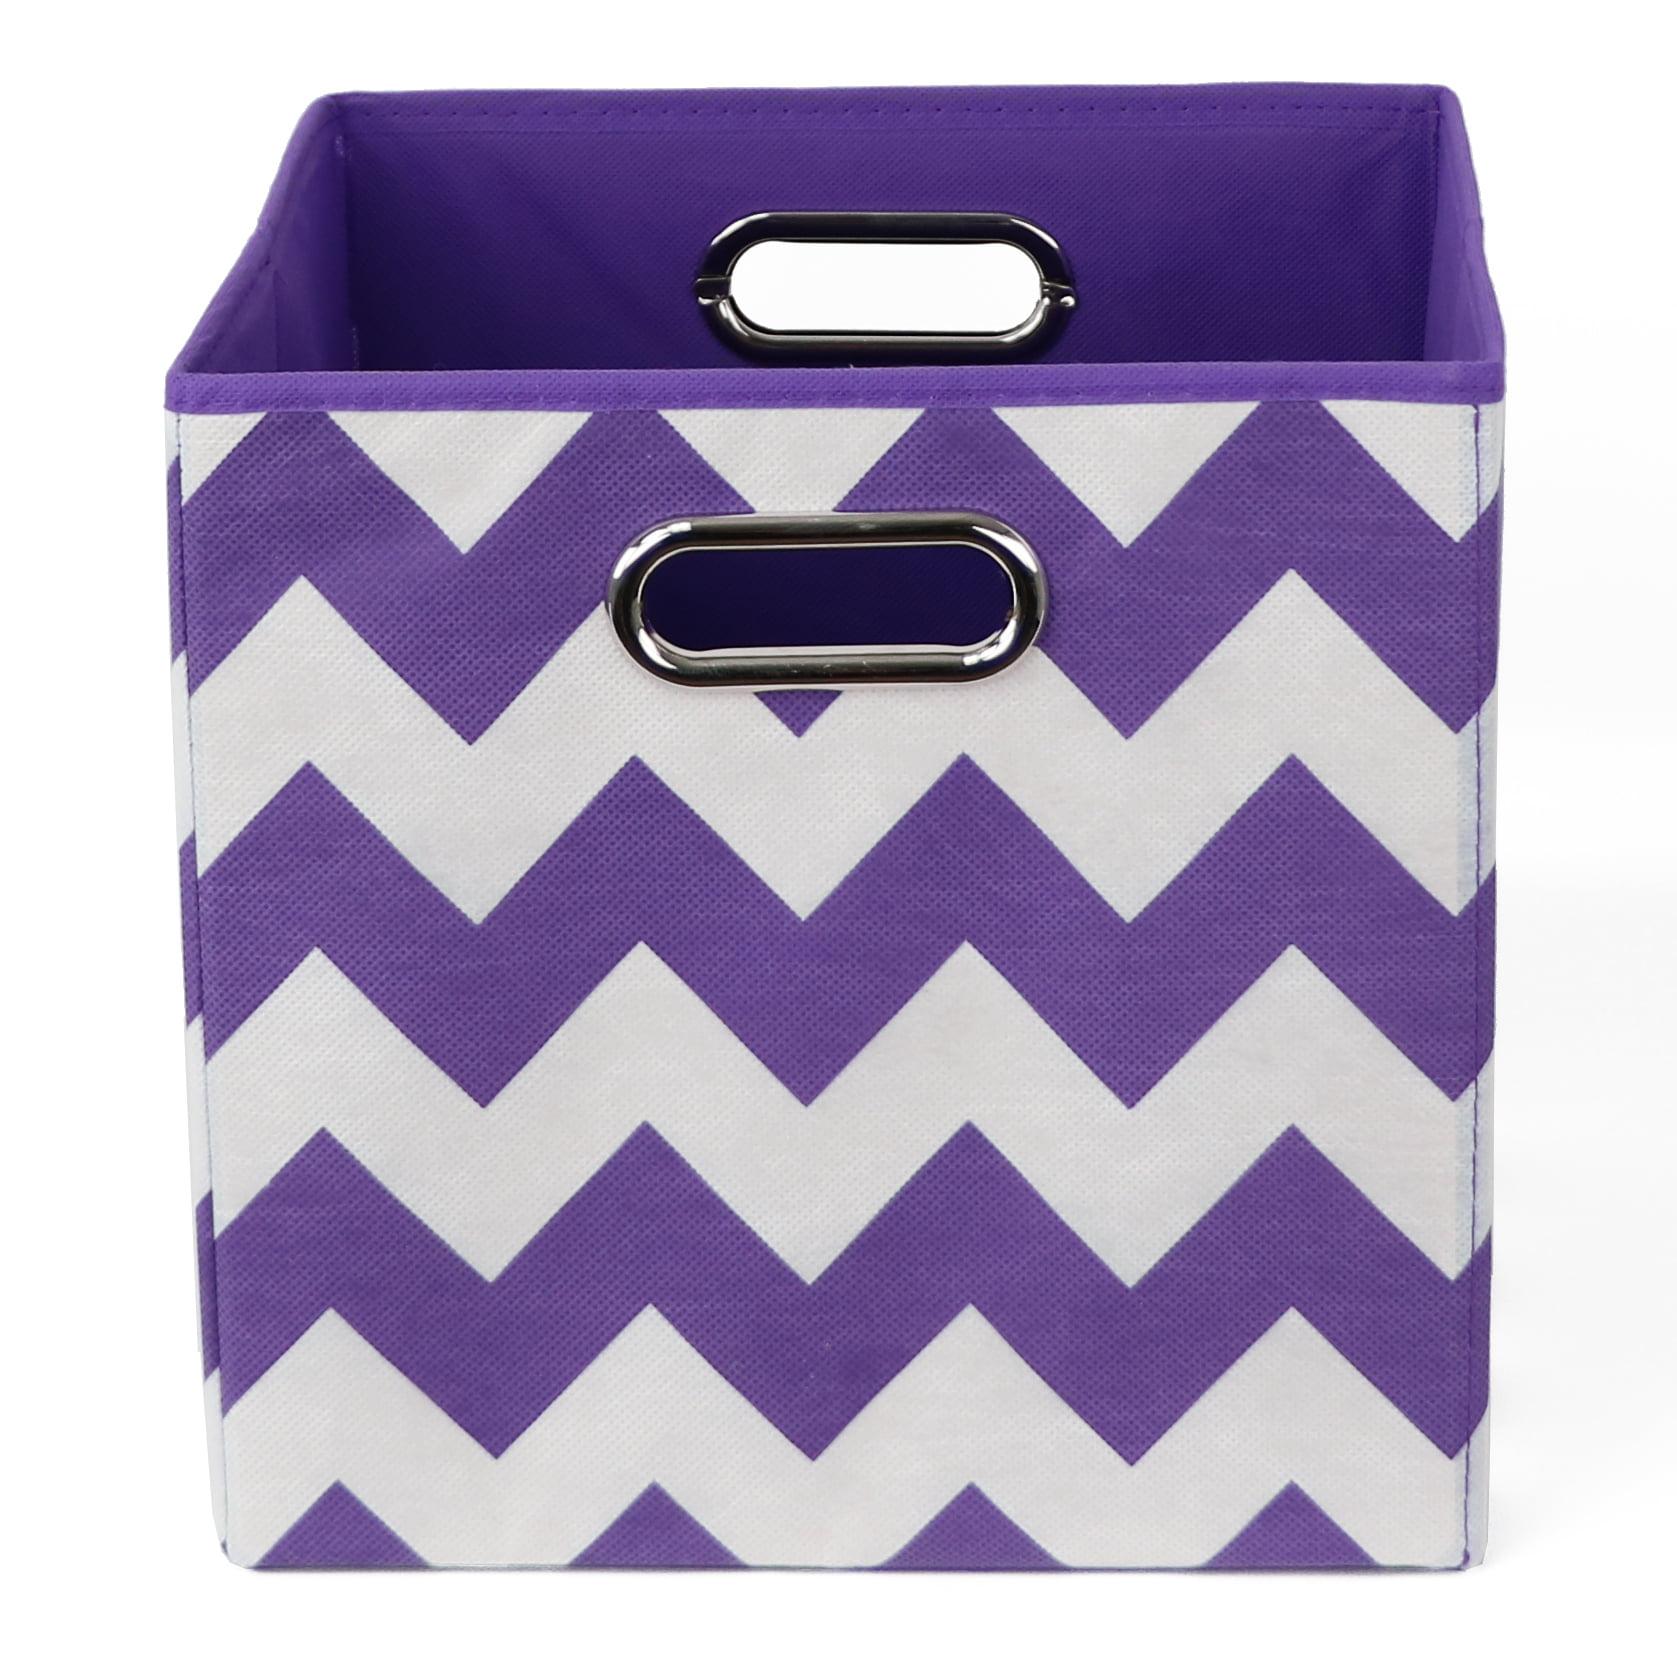 Modern Littles Color Pop Folding Storage Bin, Purple Chevron